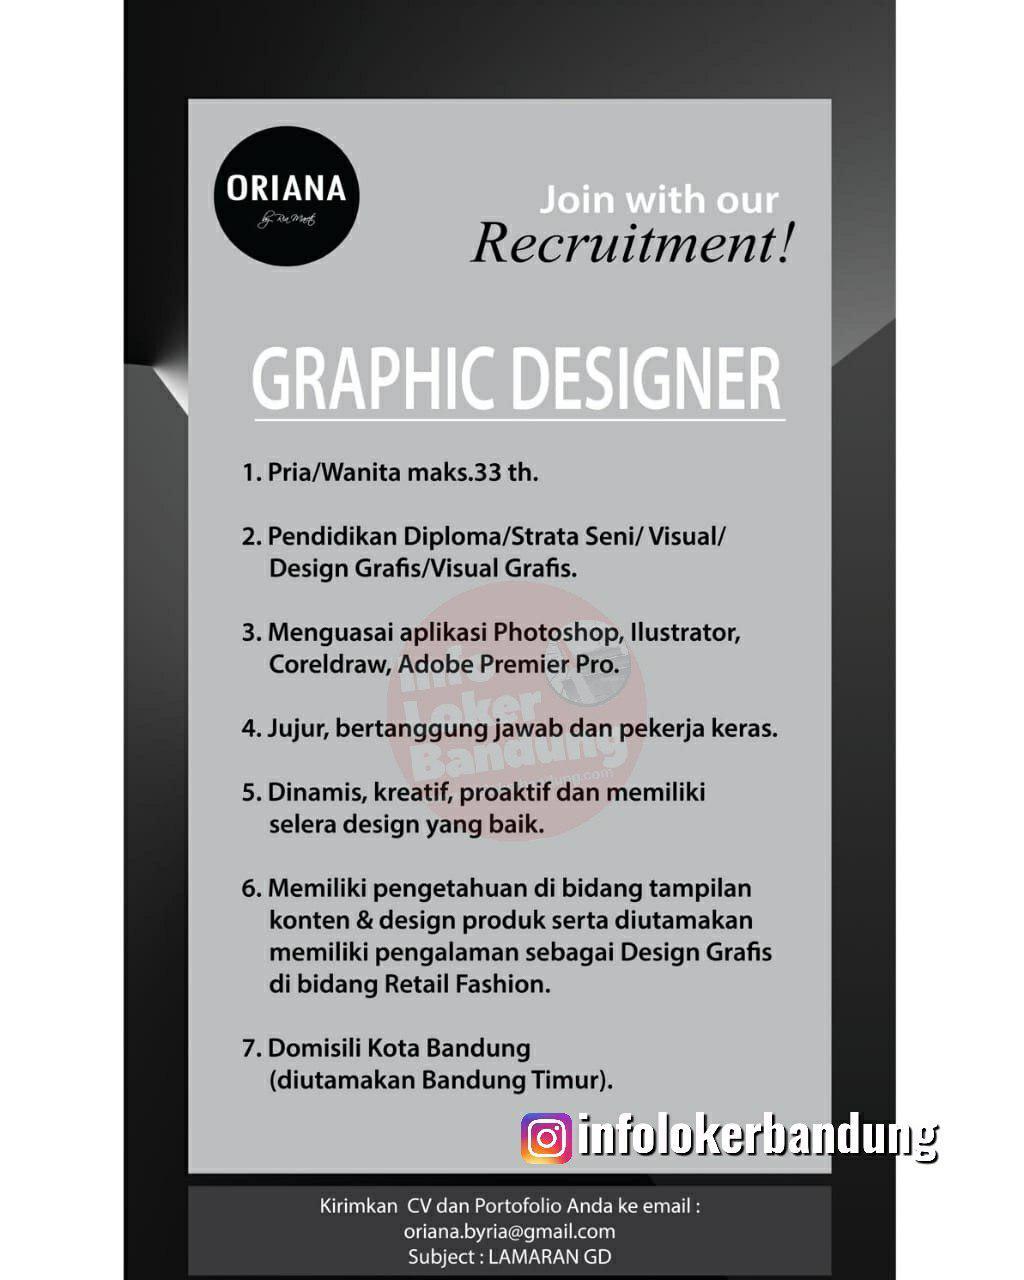 Lowongan Kerja Graphic Designer Oriana Bandung Juli 2019